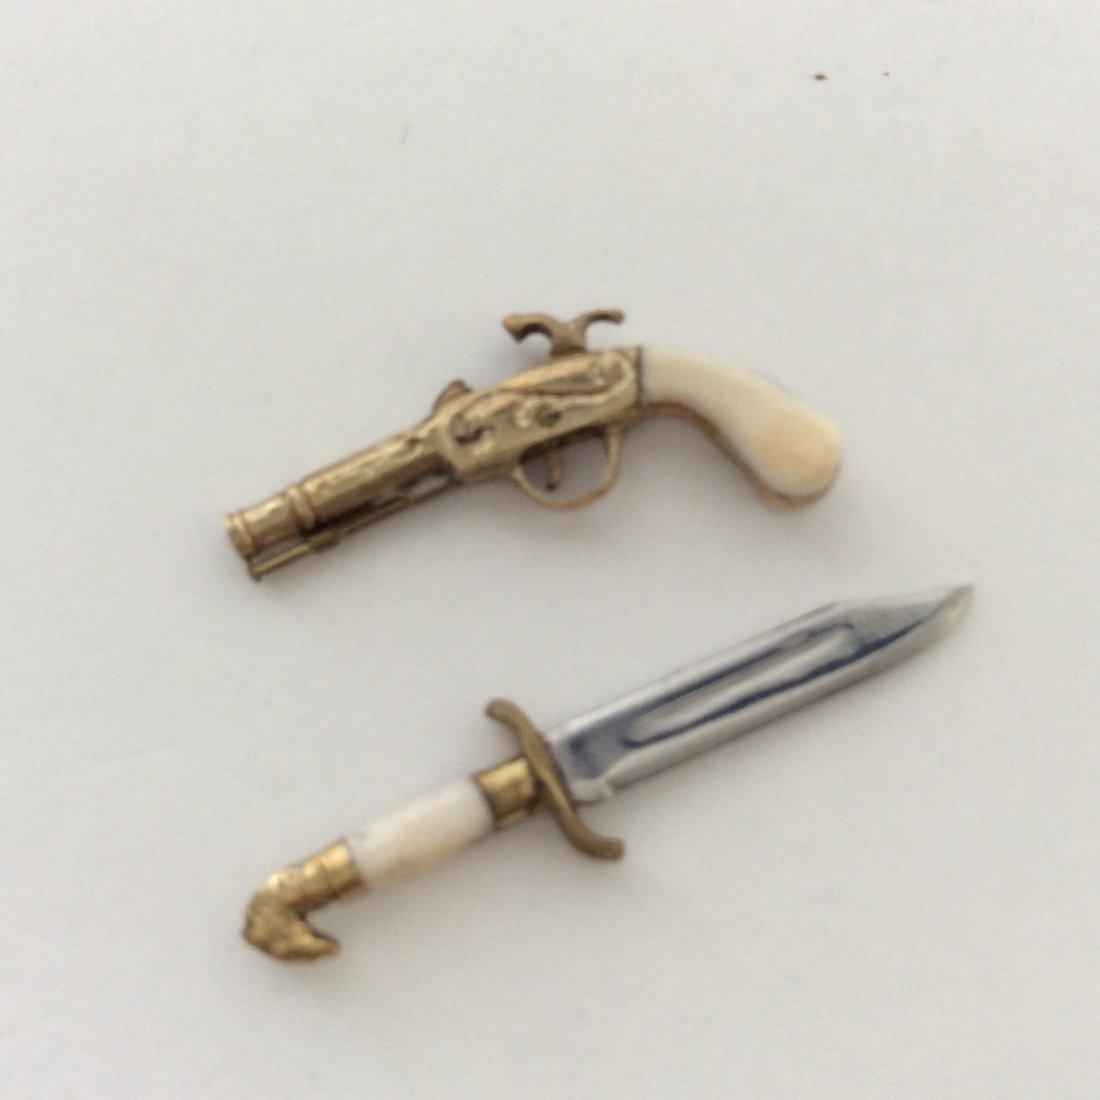 Antique 14k Miniature Percussion Pistol and Dagger